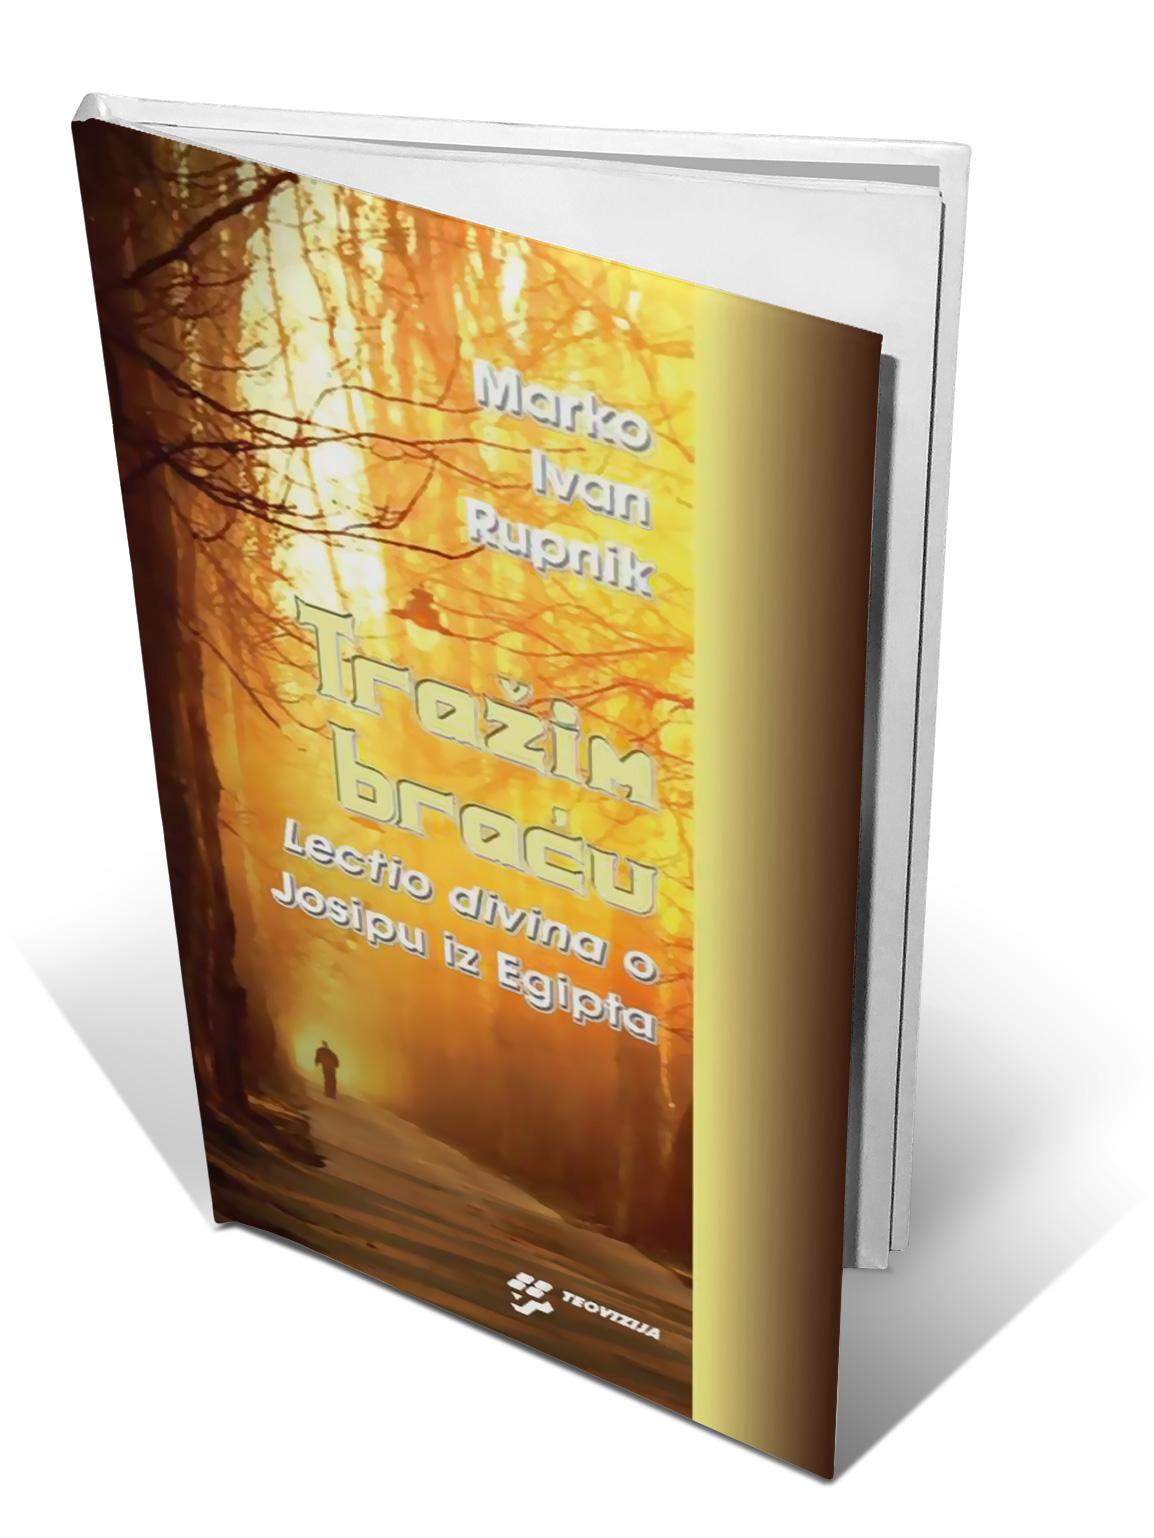 TRAŽIM BRAĆU - Marko Ivan Rupnik